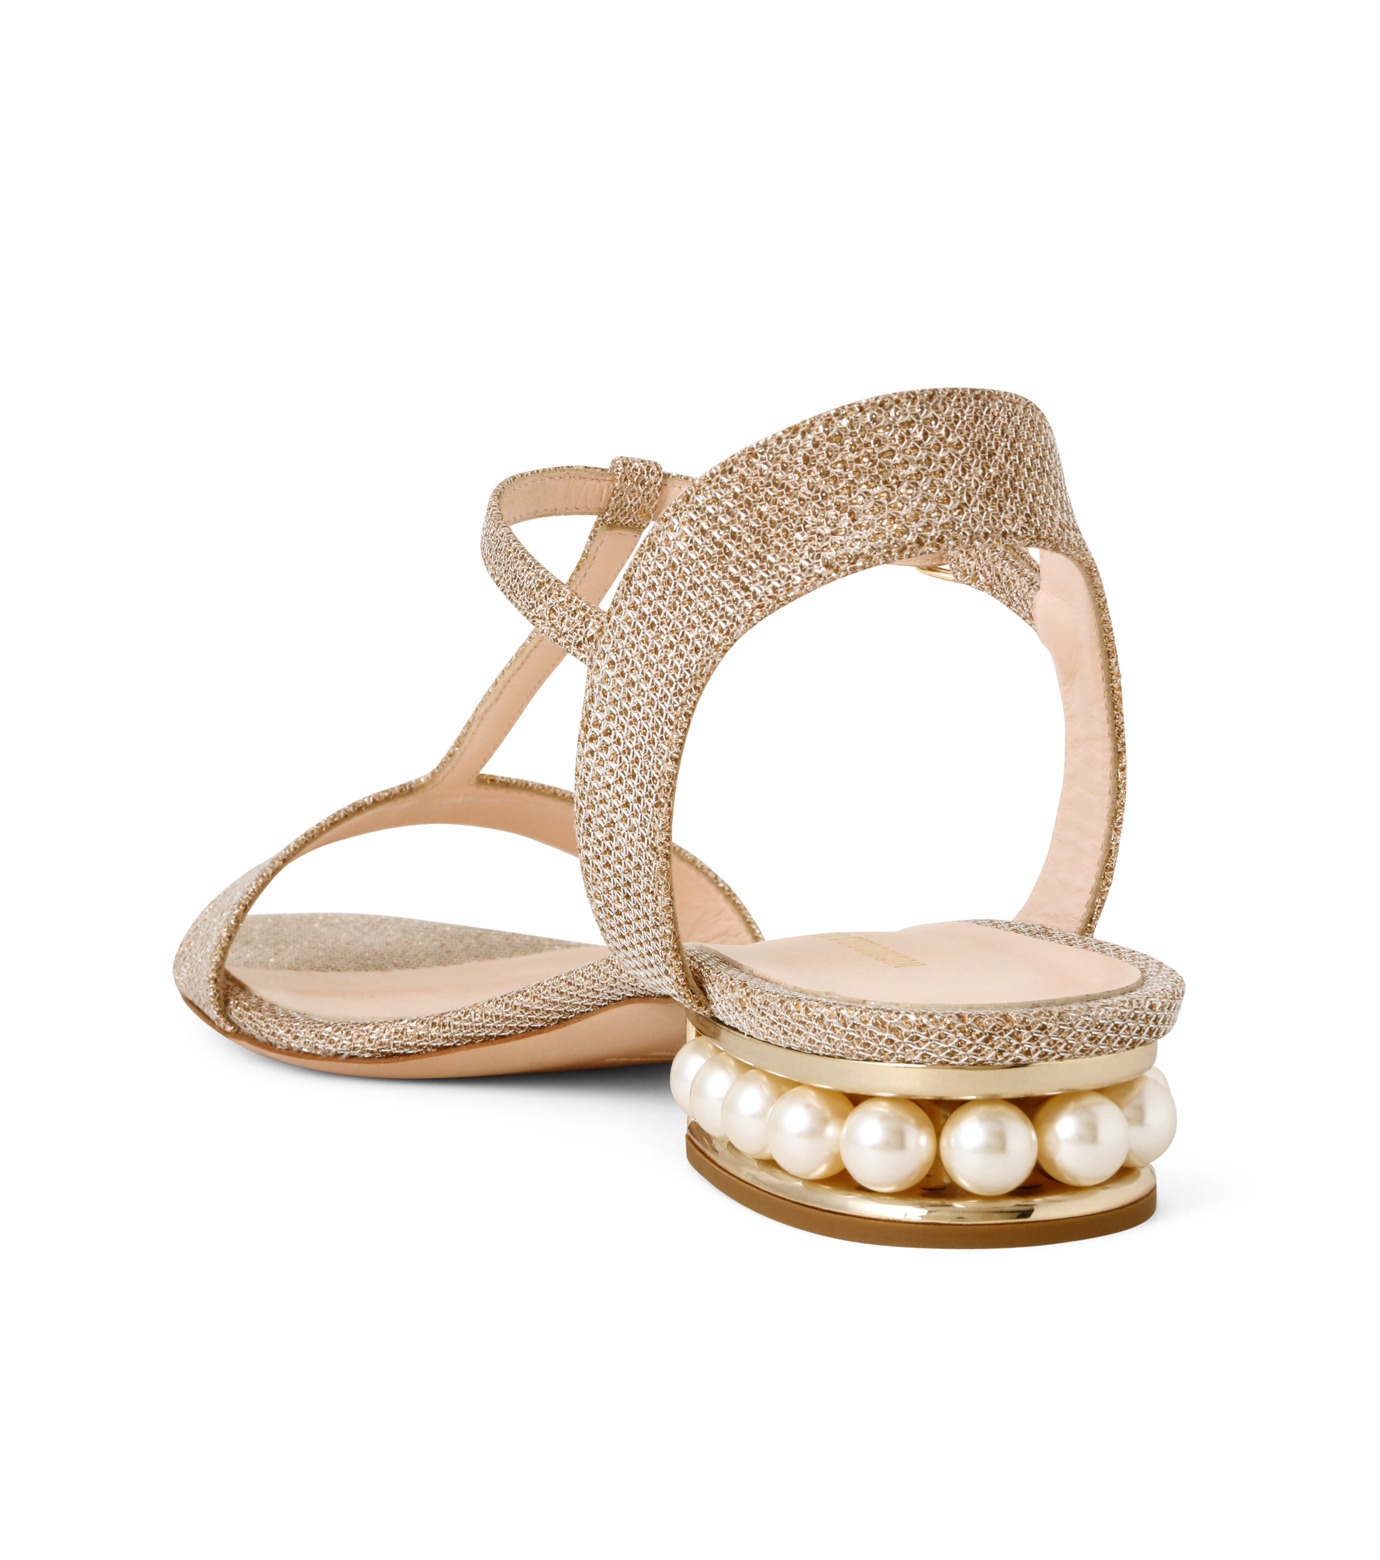 Nicholas  Kirkwood(ニコラス カークウッド)のCasati Pearl Sandal-GOLD(フラットシューズ/Flat shoes)-16S0451-2 拡大詳細画像2